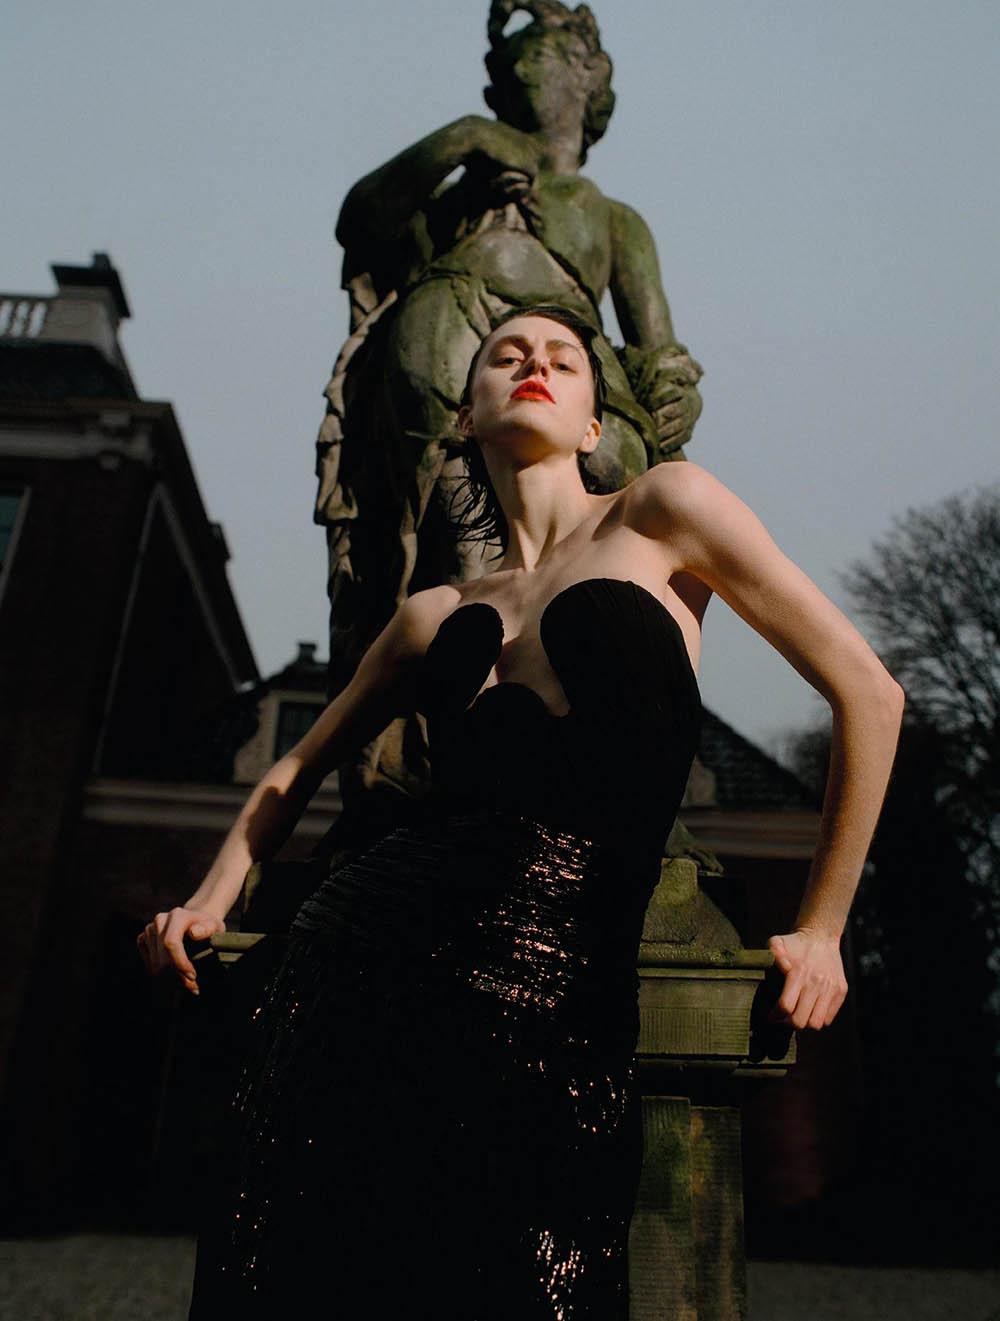 Sarah Brannon by Walter Pierre for Numéro March 2020